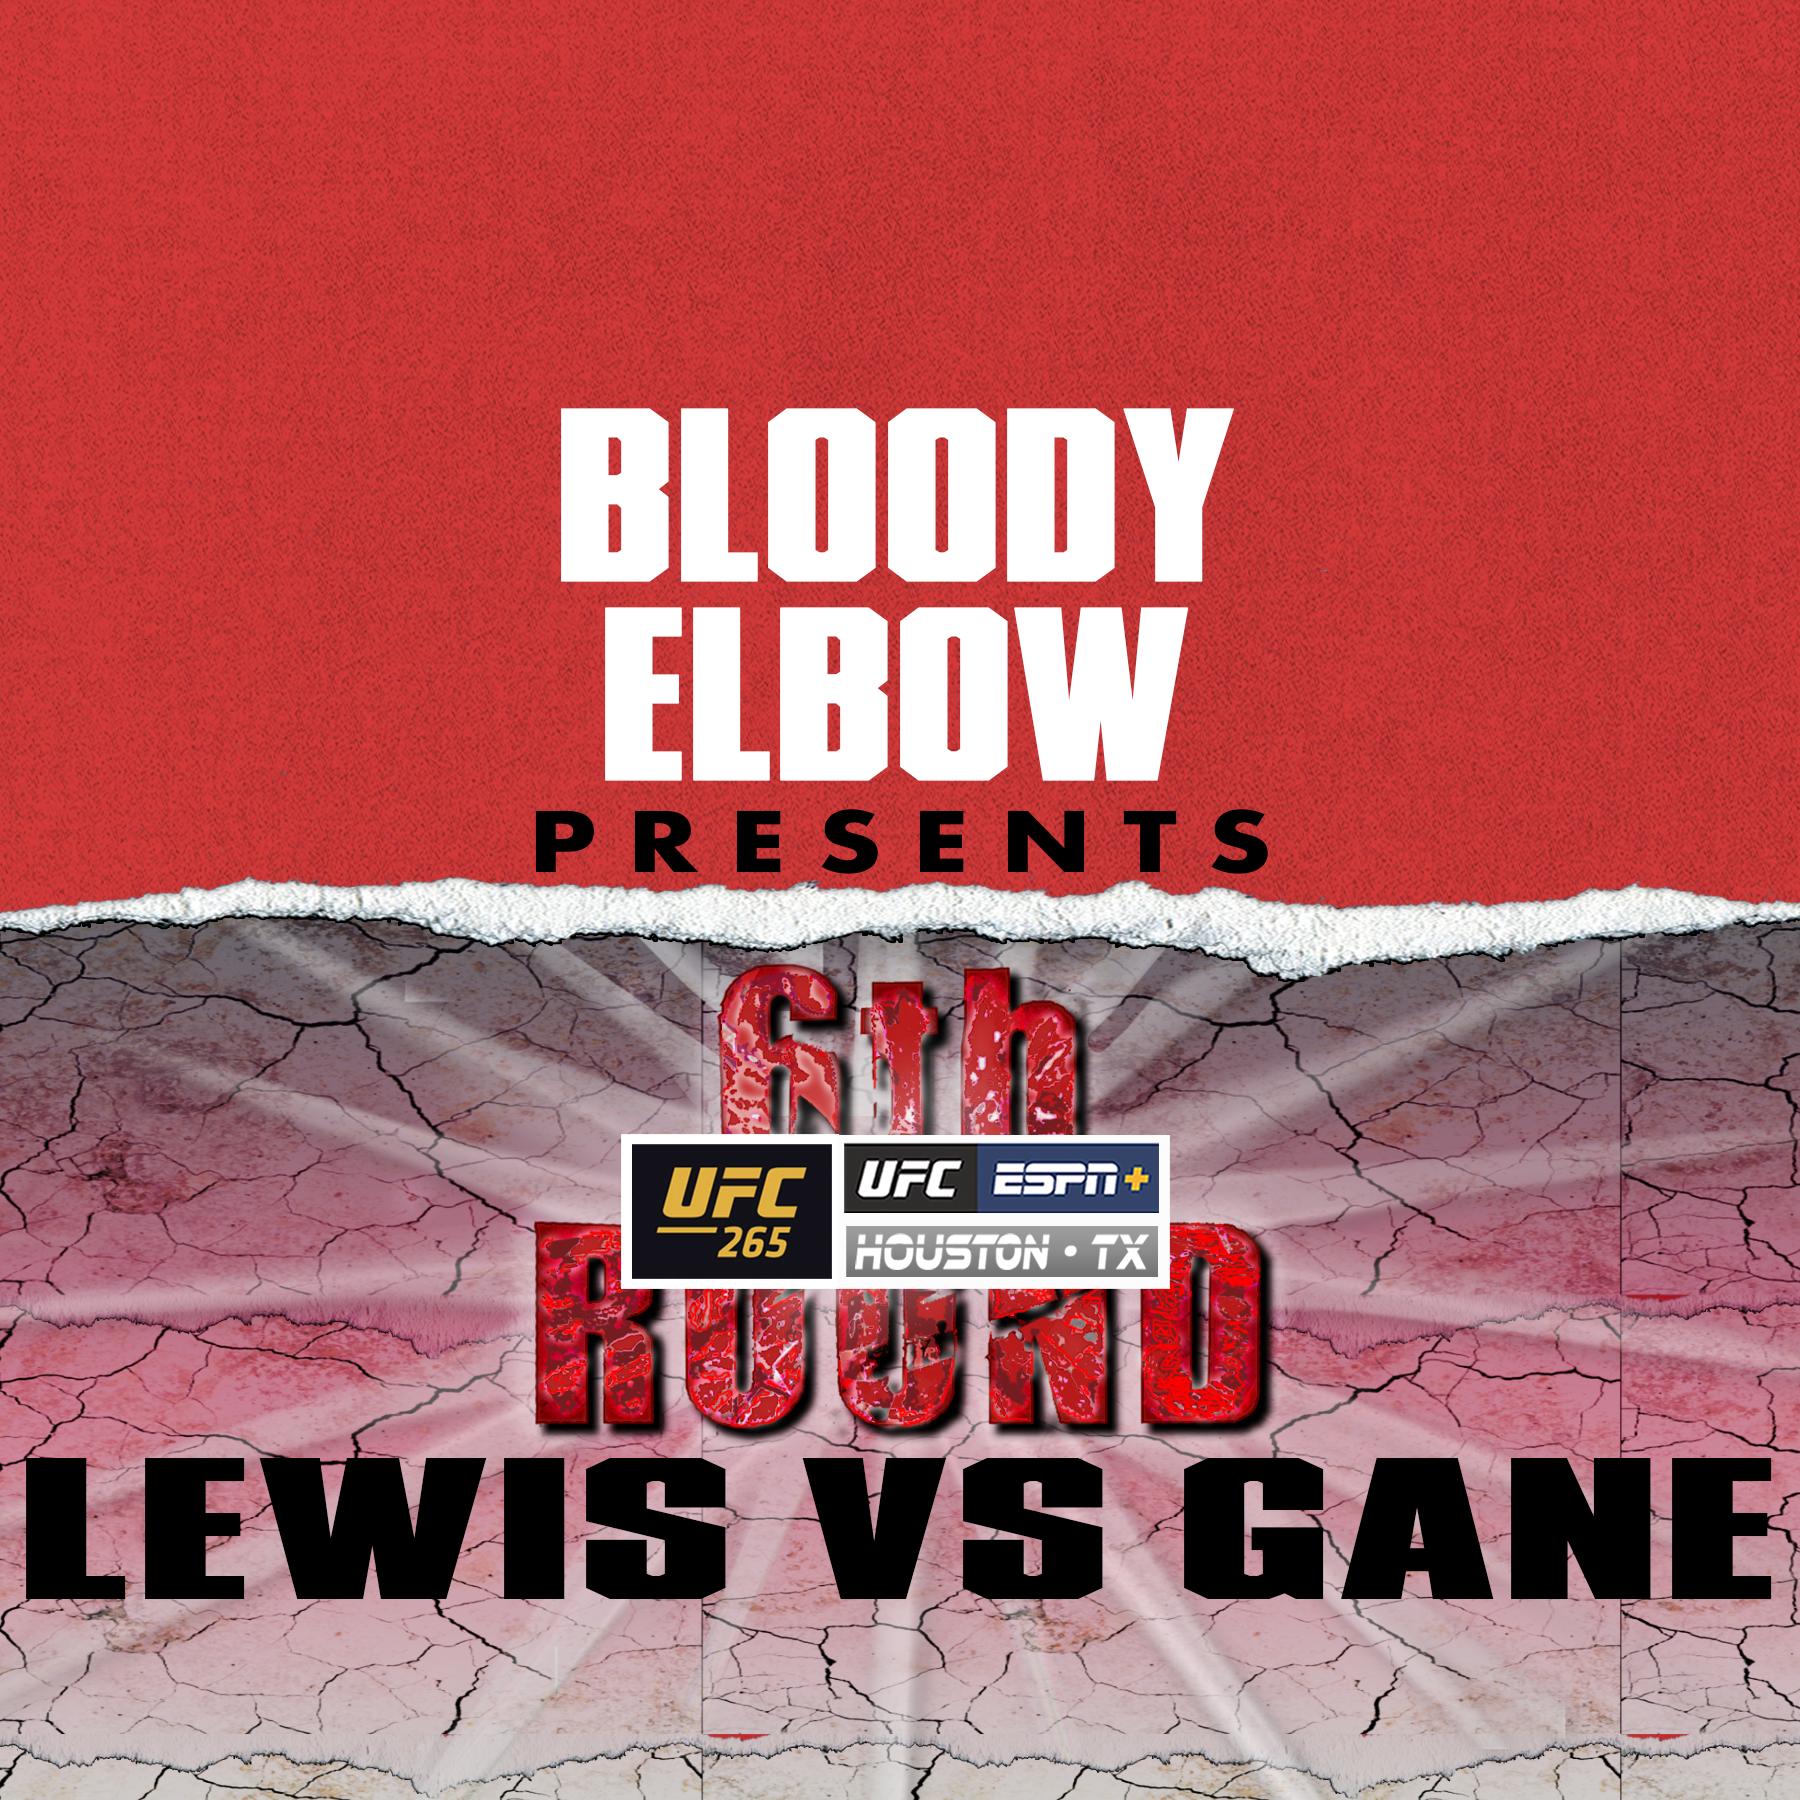 6th Rd, 6th Round Post-Fight Show, UFC 265, UFC 265 Post Fight Show, Derrick Lewis vs Ciryl Gane, UFC Results, UFC Reactions, UFC Analysis, Zane Simon, Eddie Mercado,